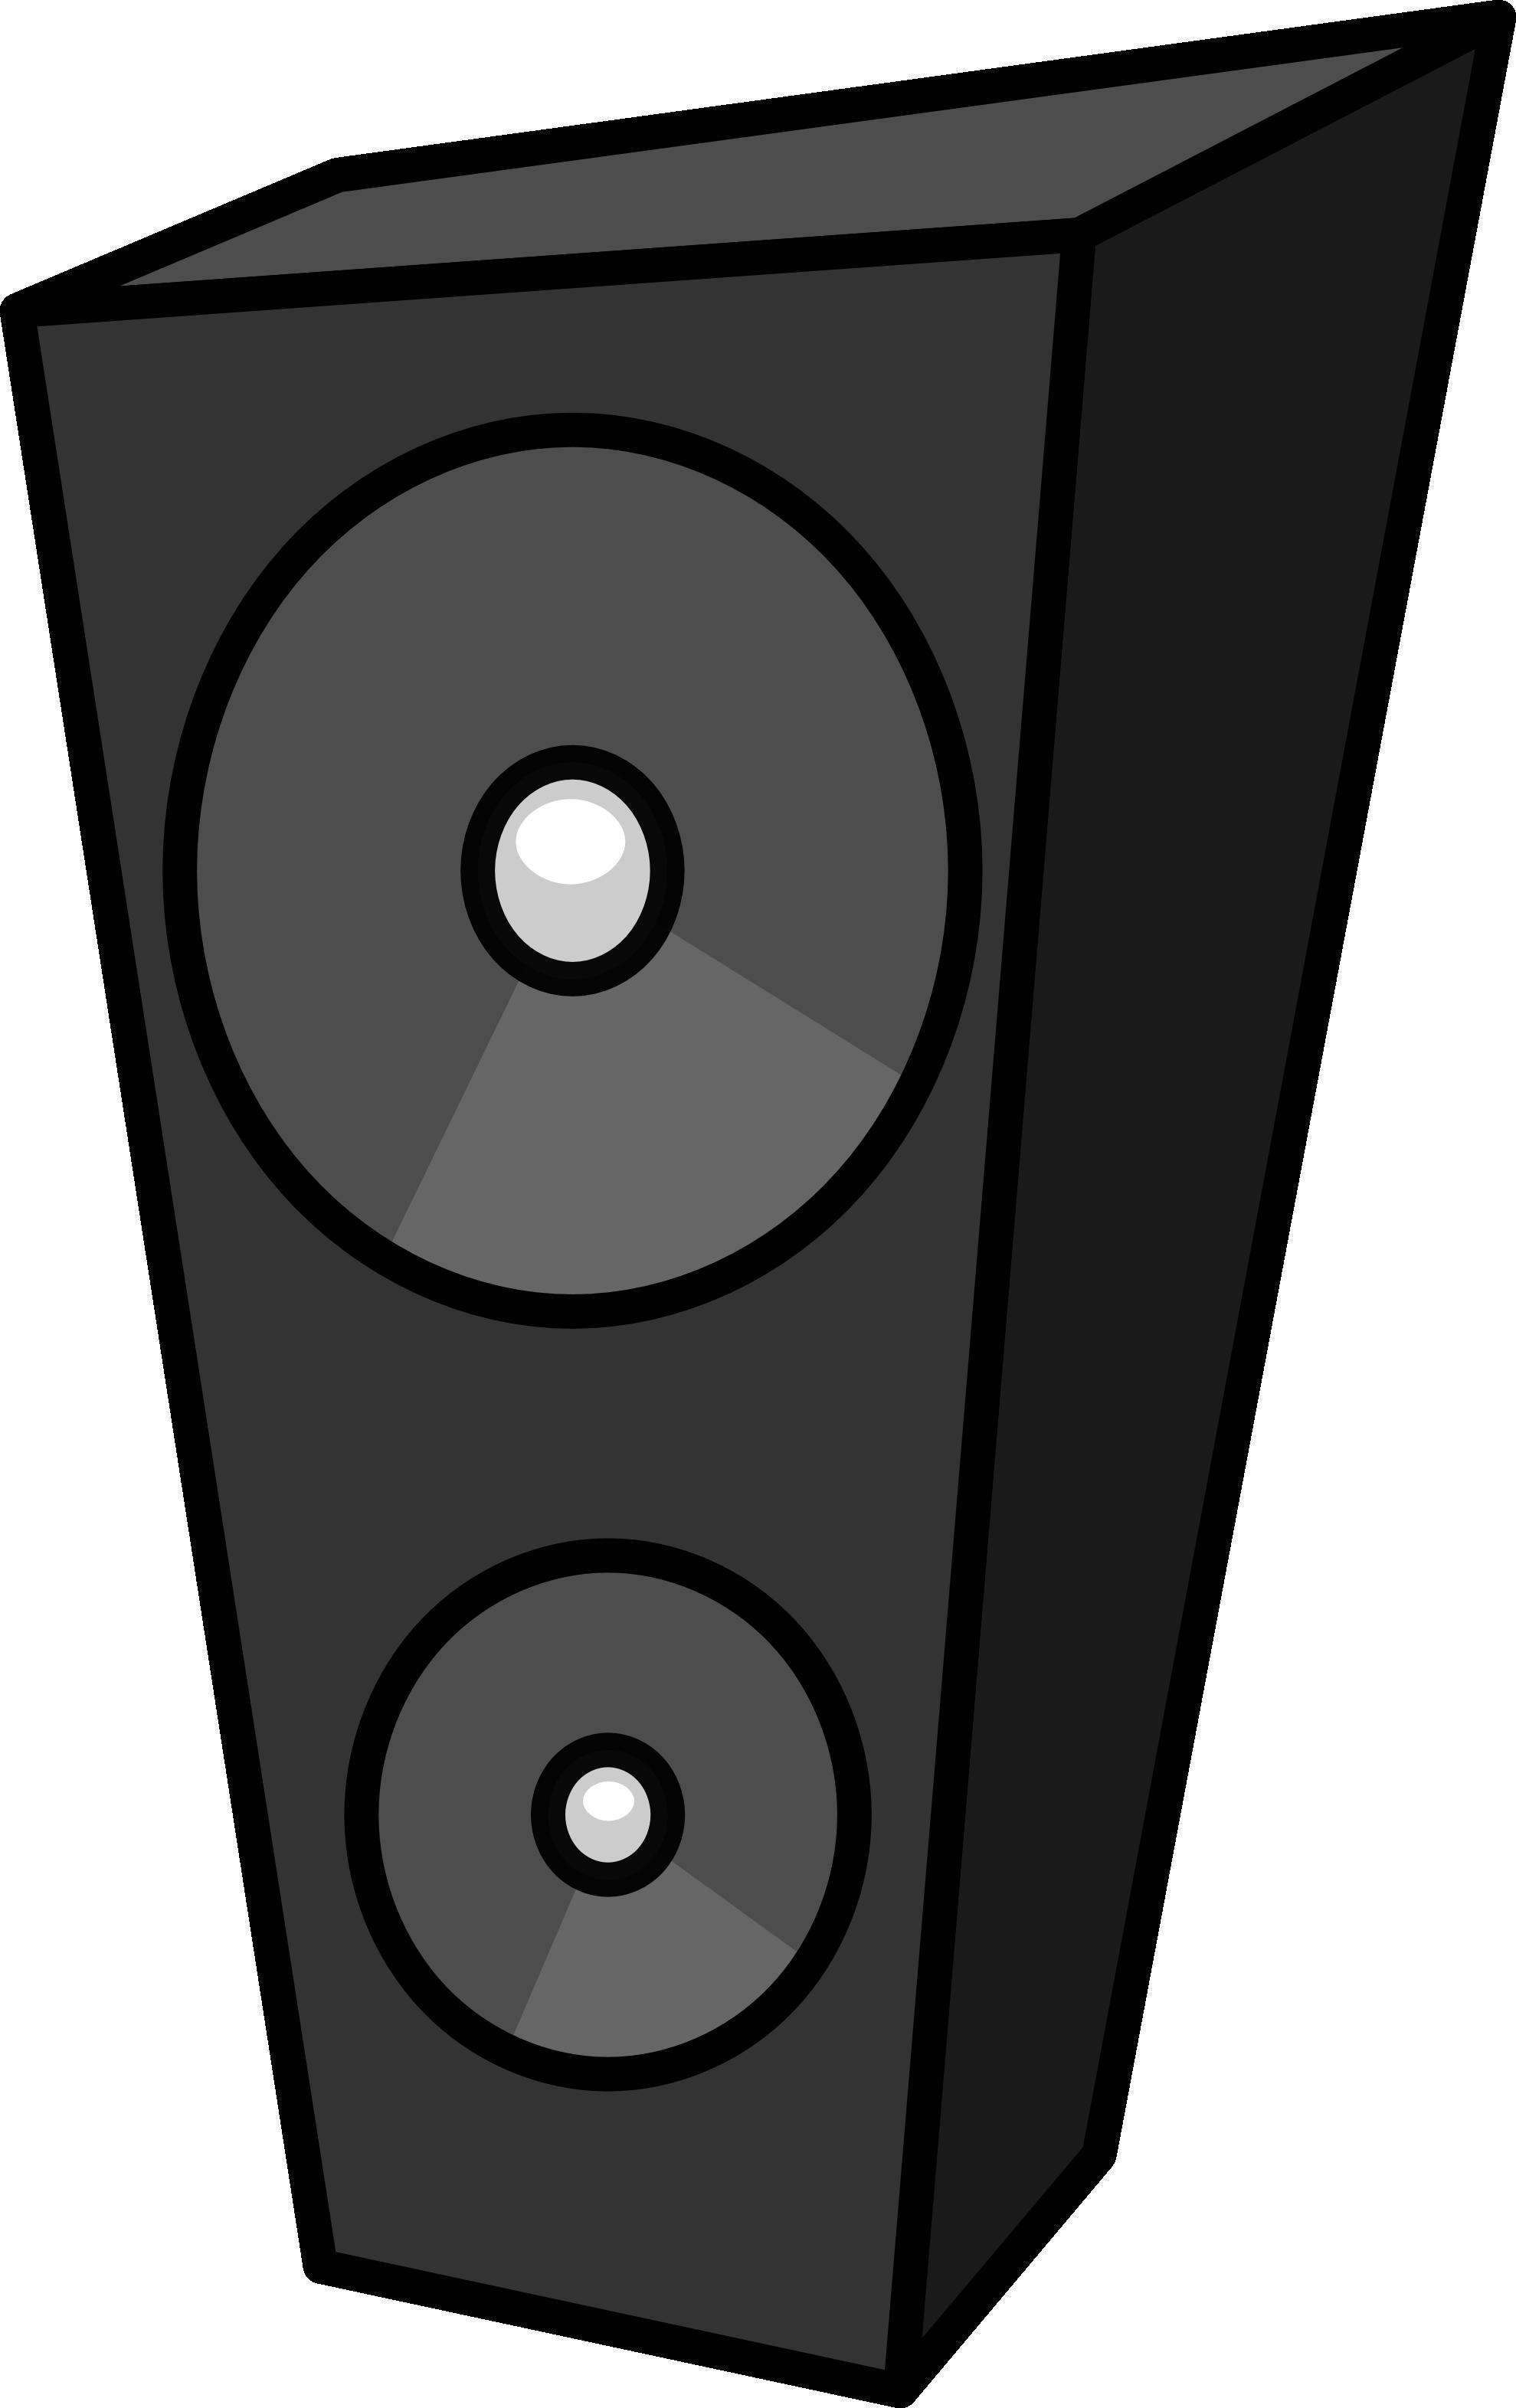 Speakers clipart. Clip art panda free